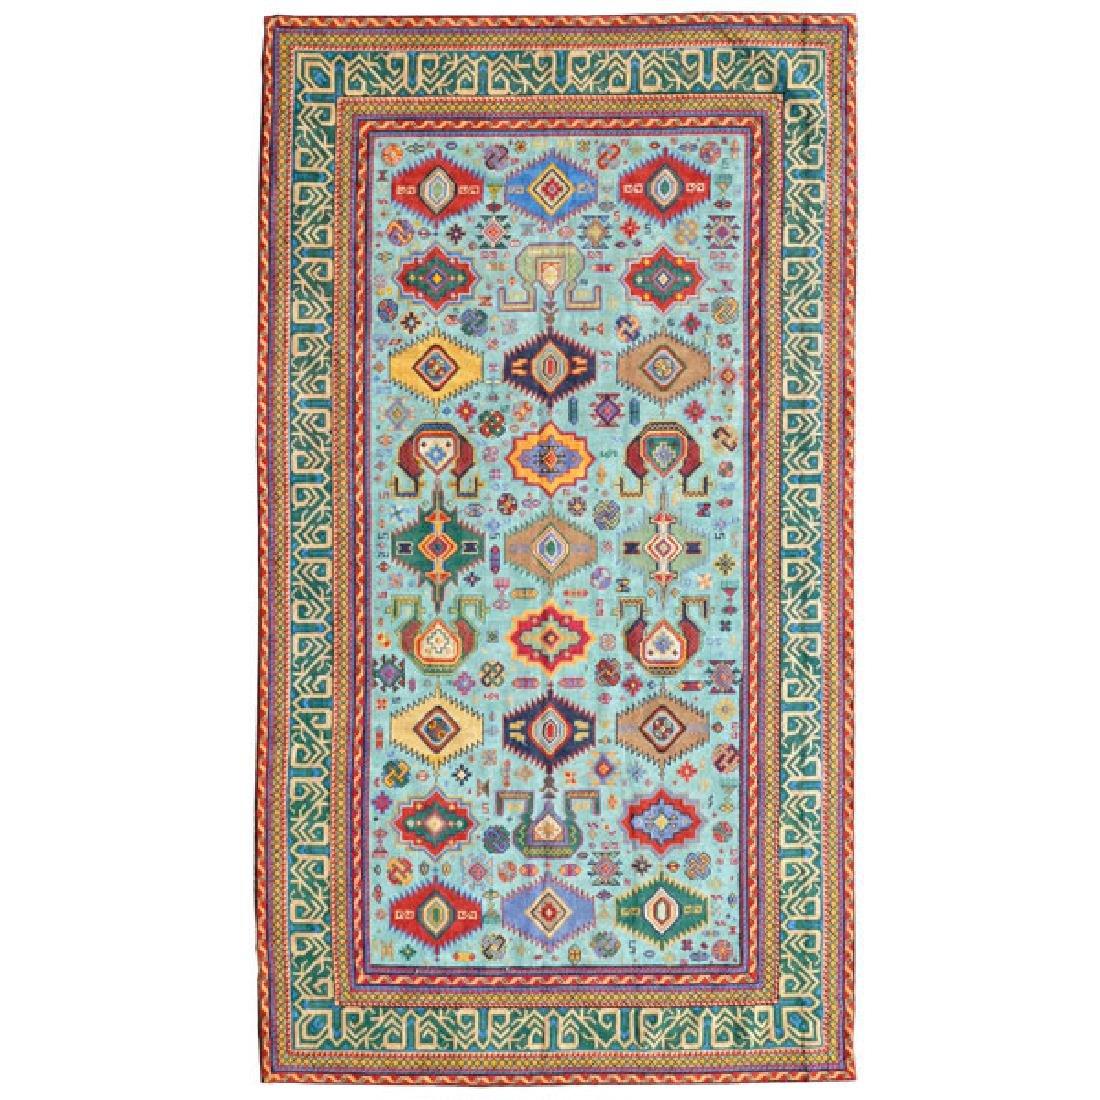 Kazak Souzani Needlework Rug: 4 feet 1 inch x 7 feet